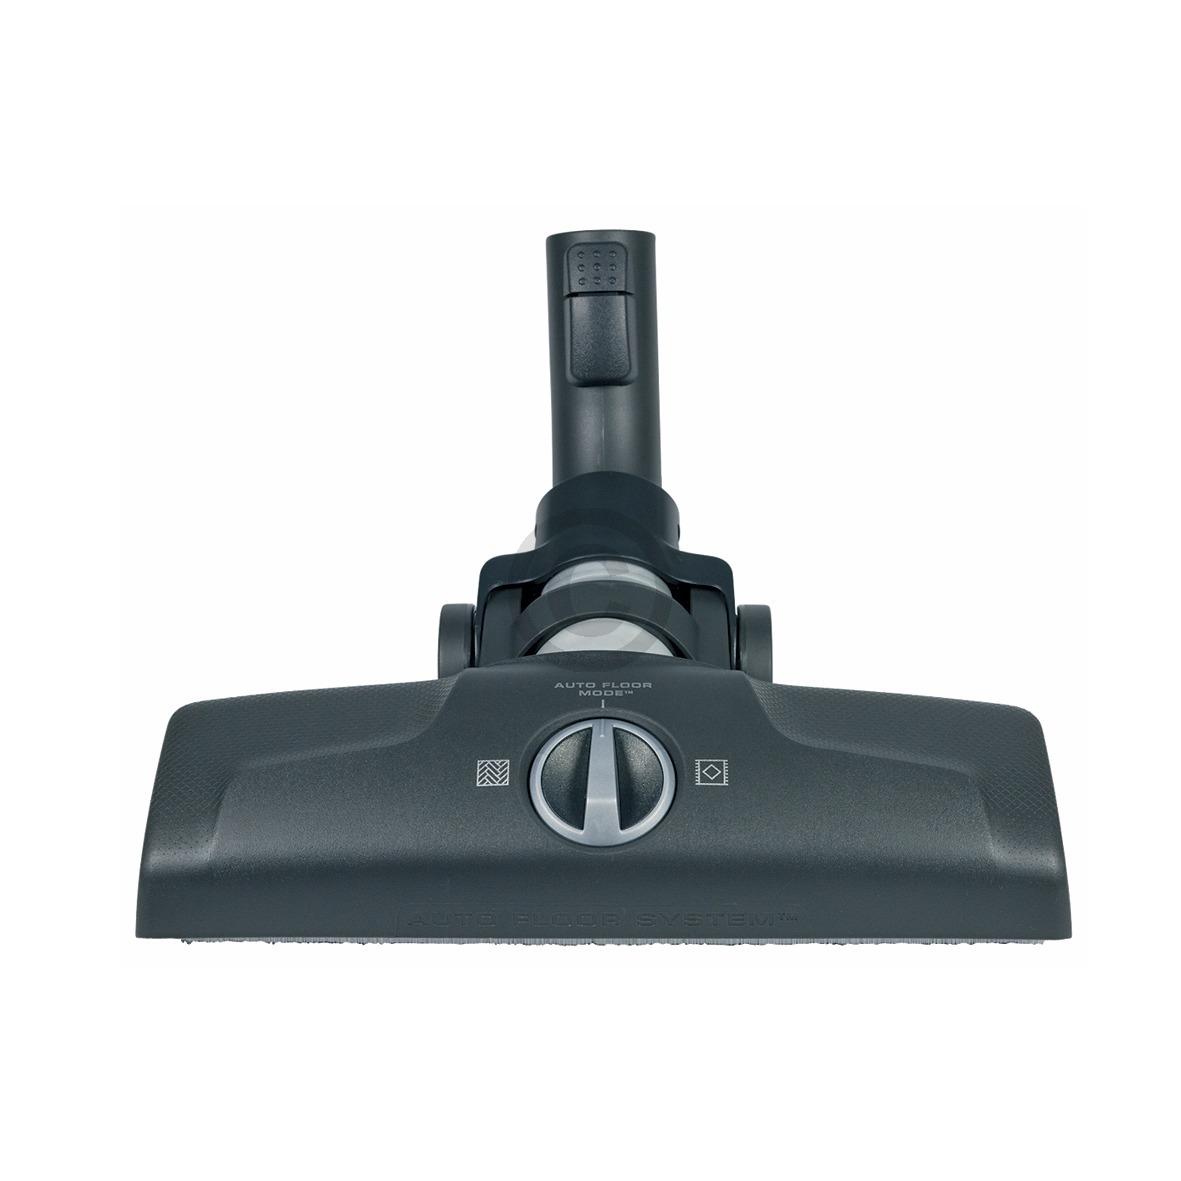 Bodendüse Bodenbürste für 32mmØ AEG Vario4000 900166738/6 Original Universal!